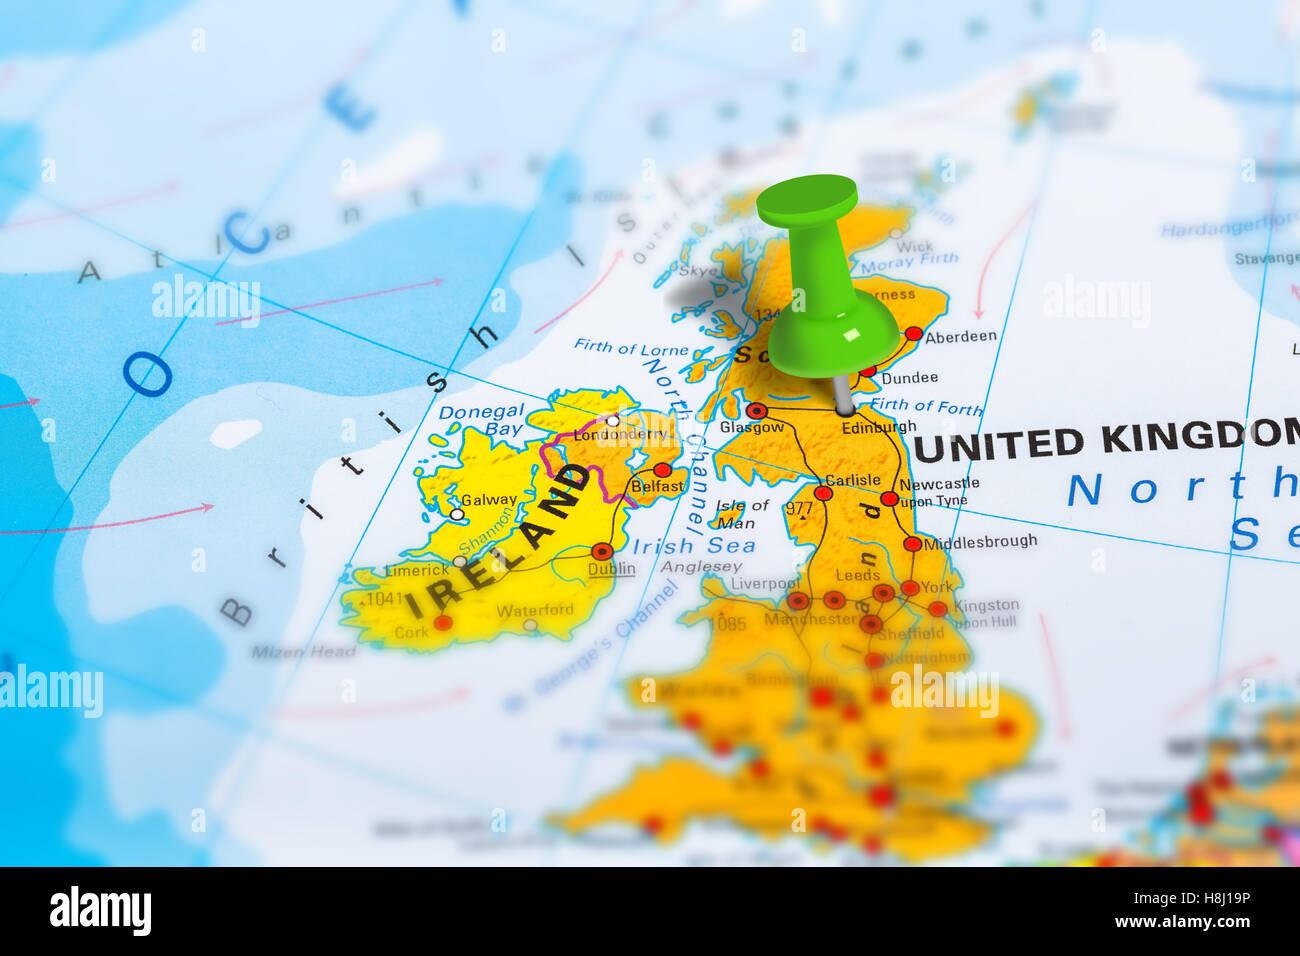 Edinburg Scotland map - Stock Image